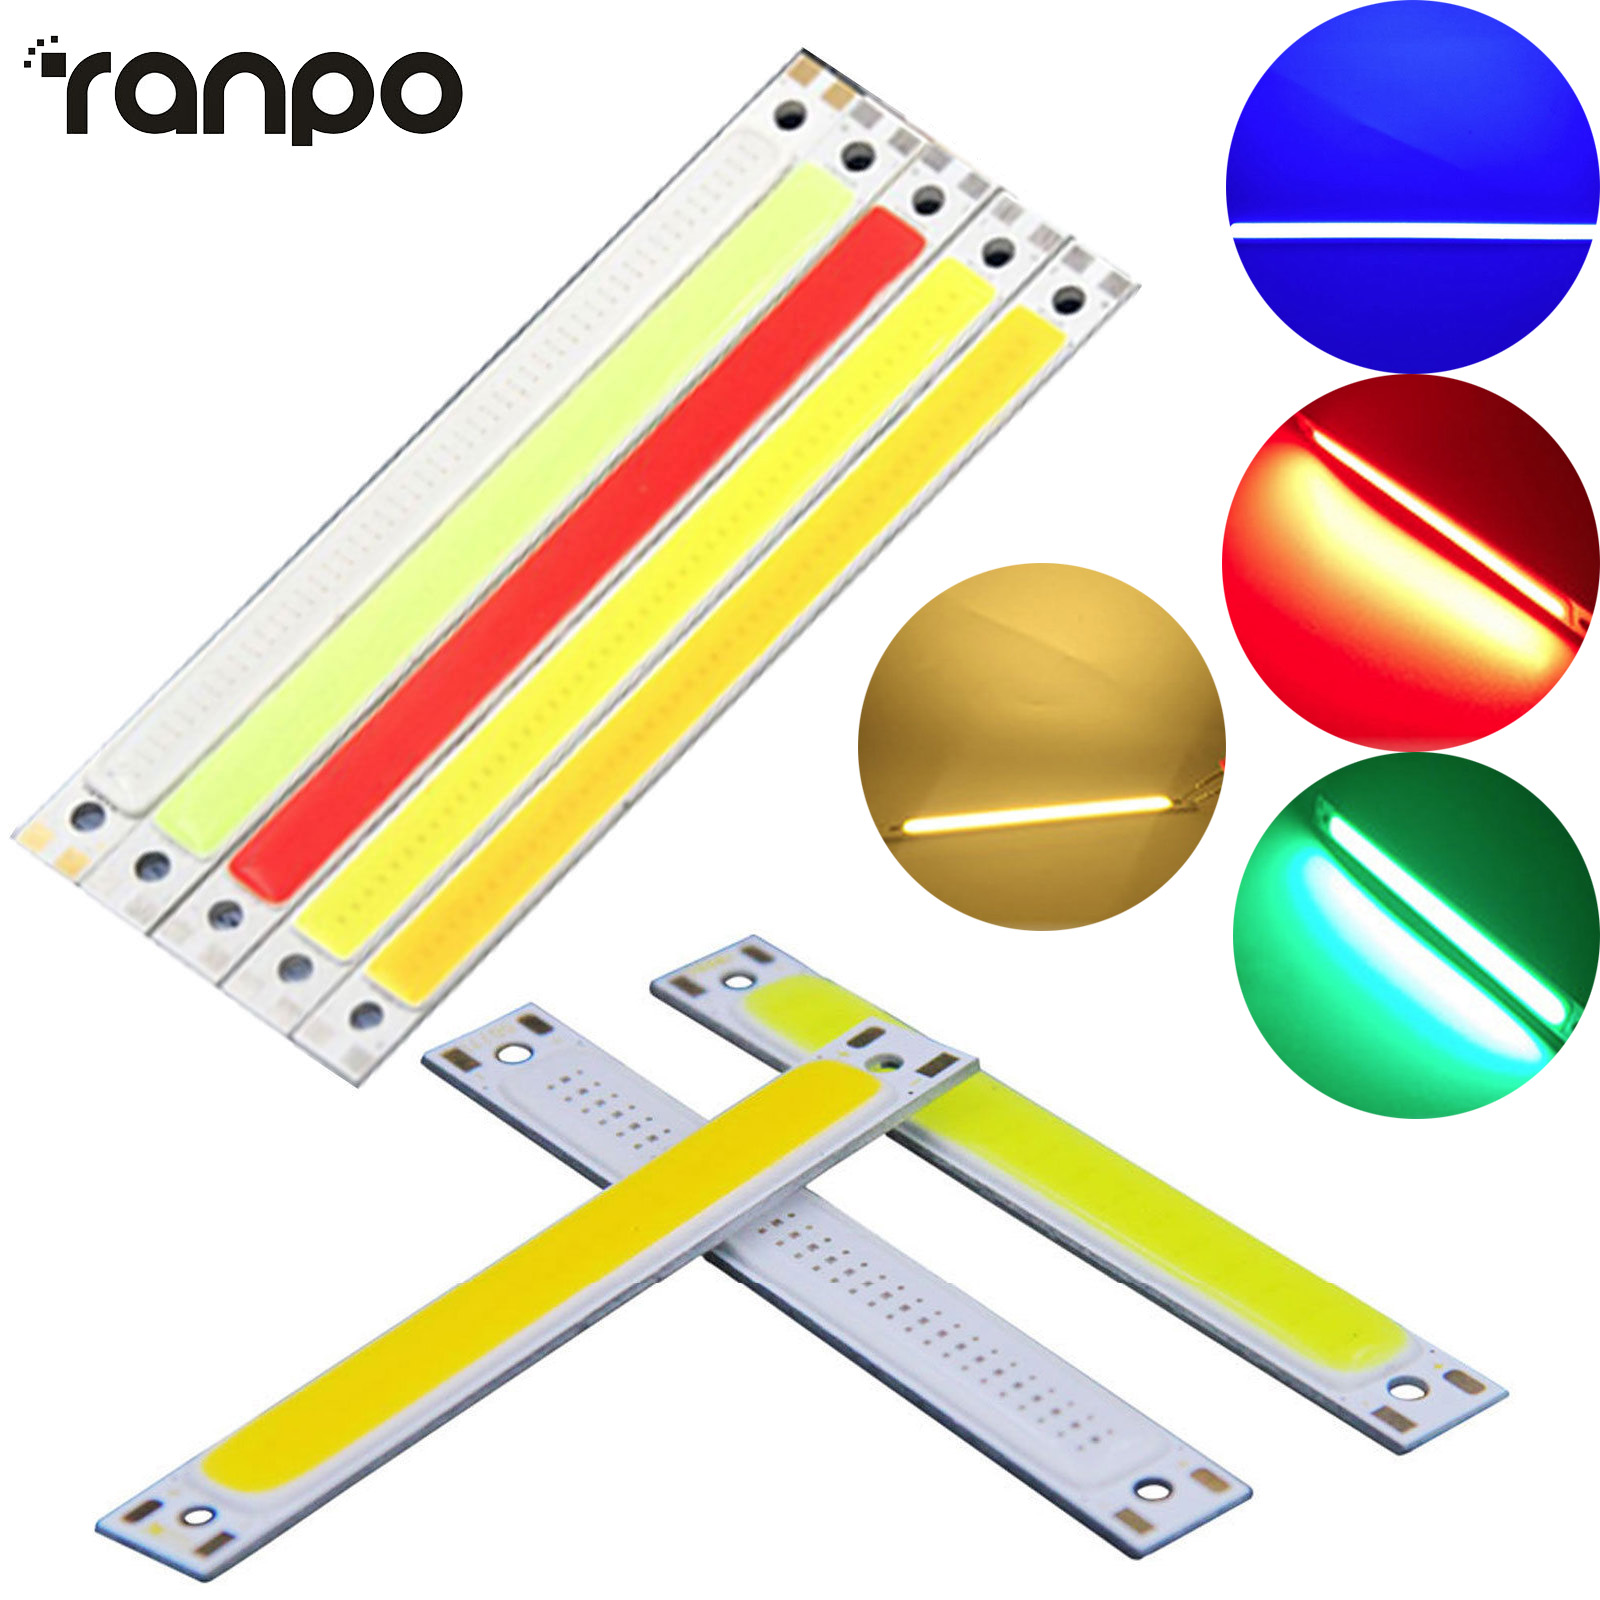 LED COB Light Strip Panel Lamp DC 12V 10W CarVehicle Floodlight Source Bulbs 5 Colors For DIY Lighting 120mm X 9mm